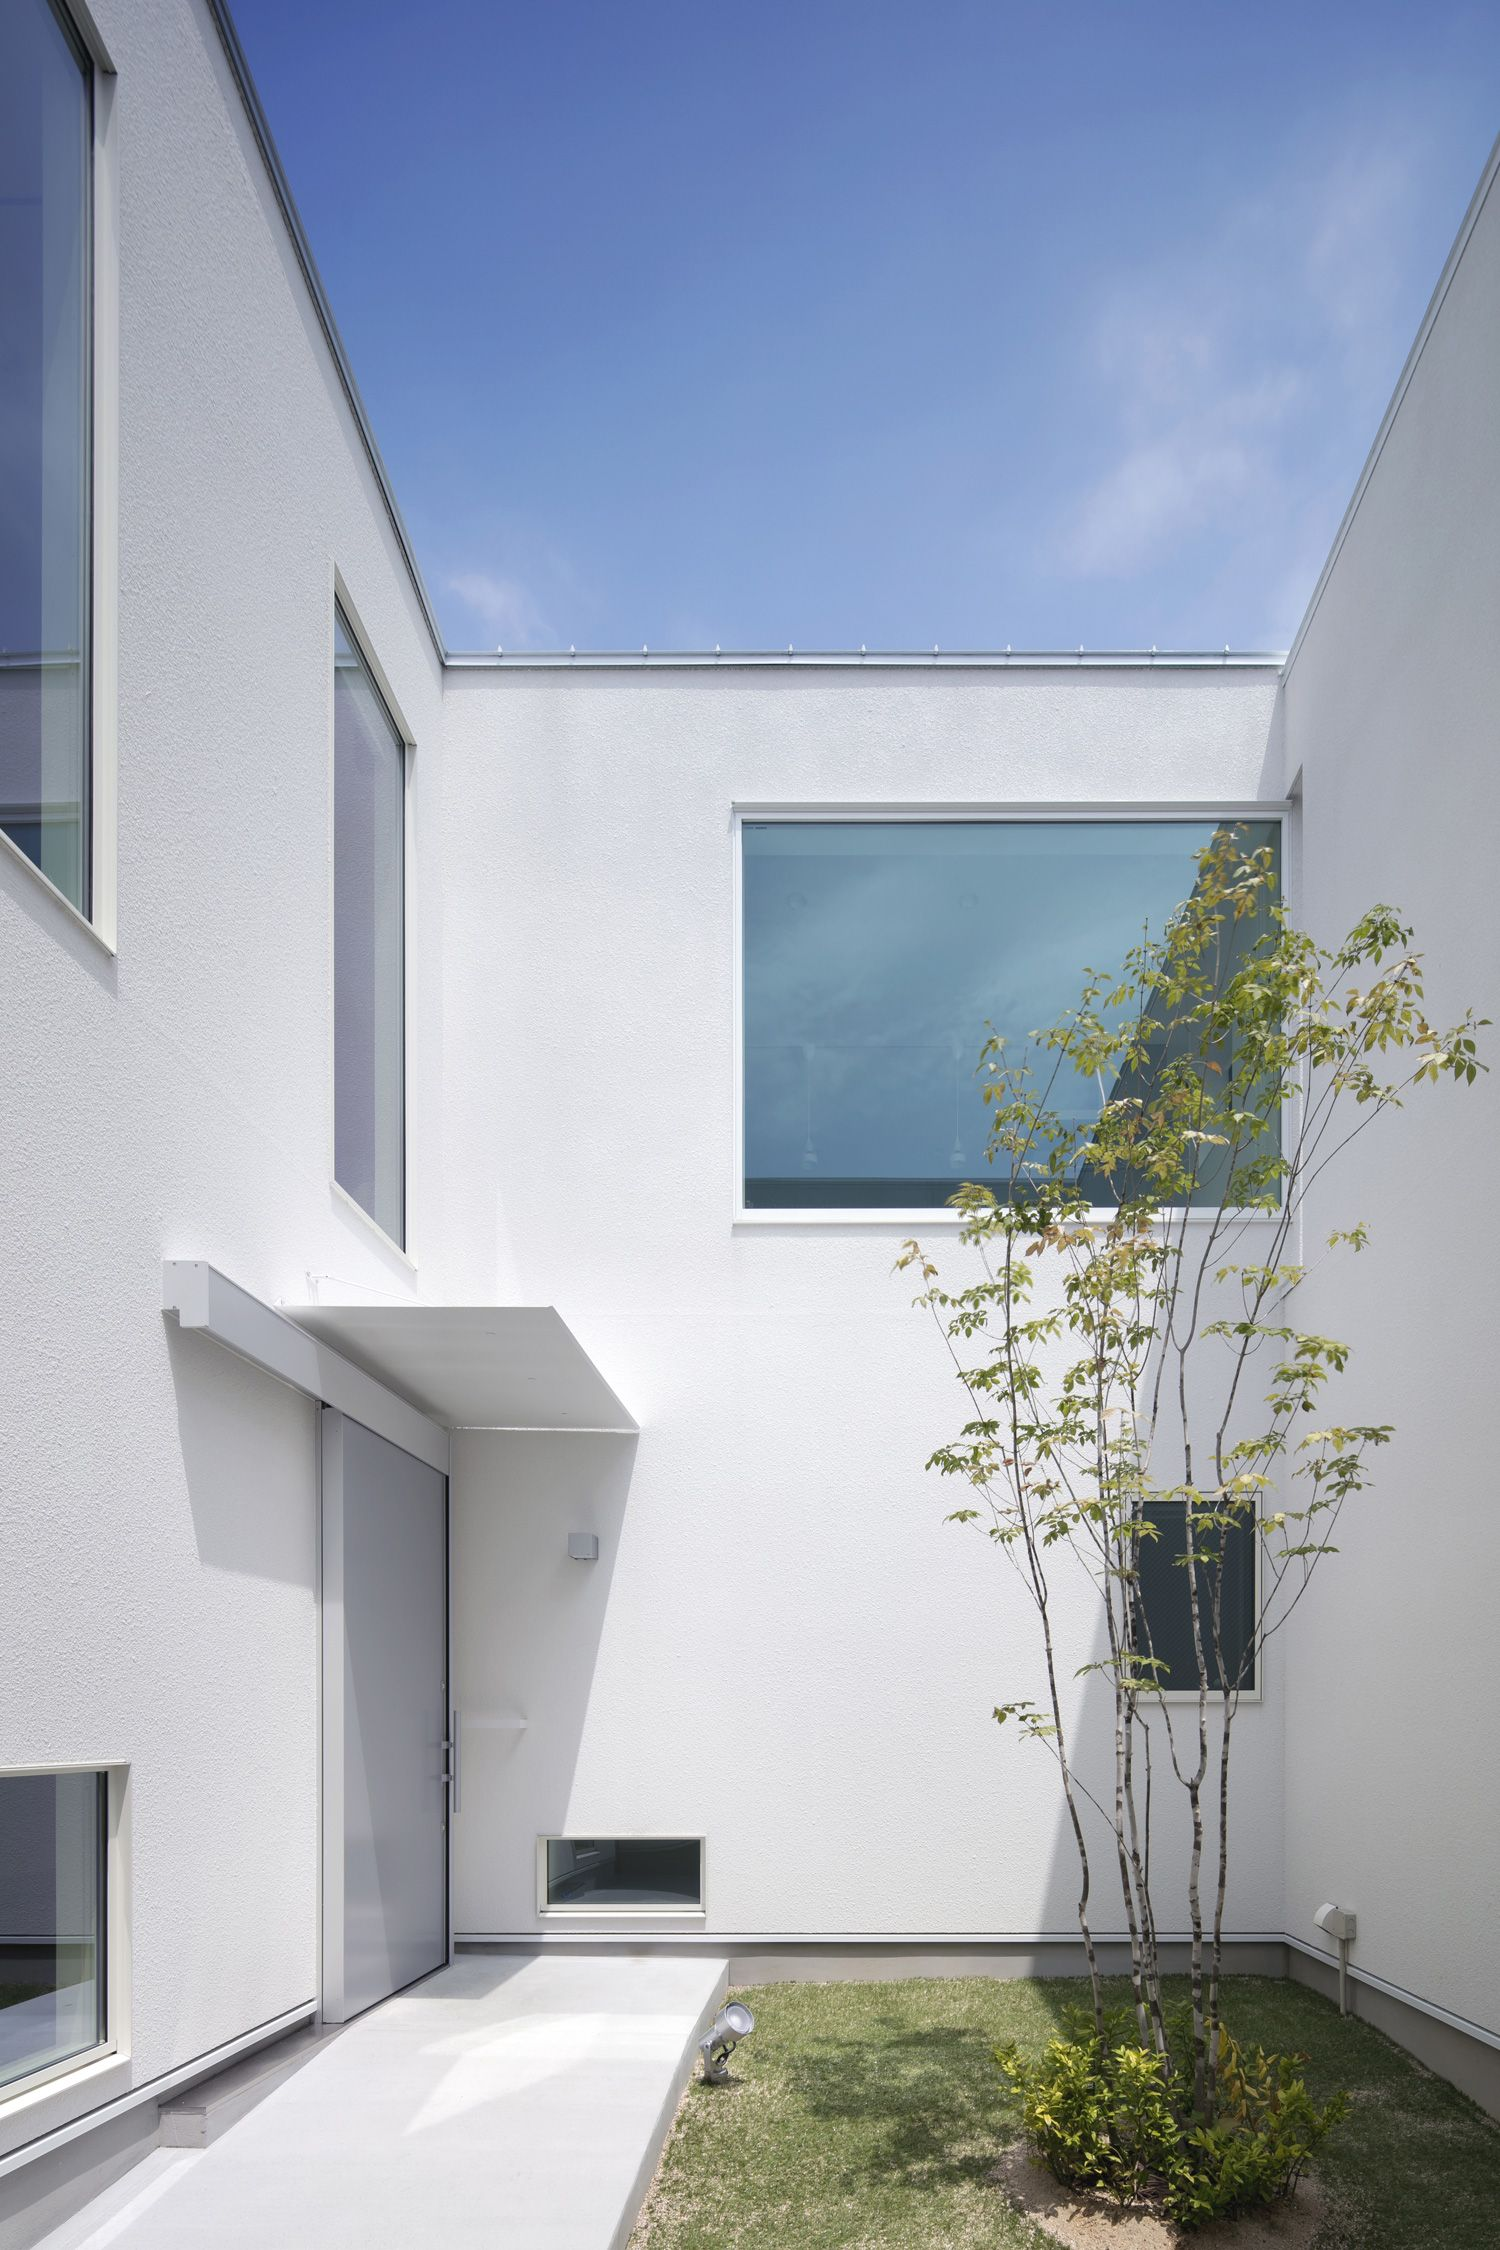 Case519 L A V 建築家 住宅 建築物